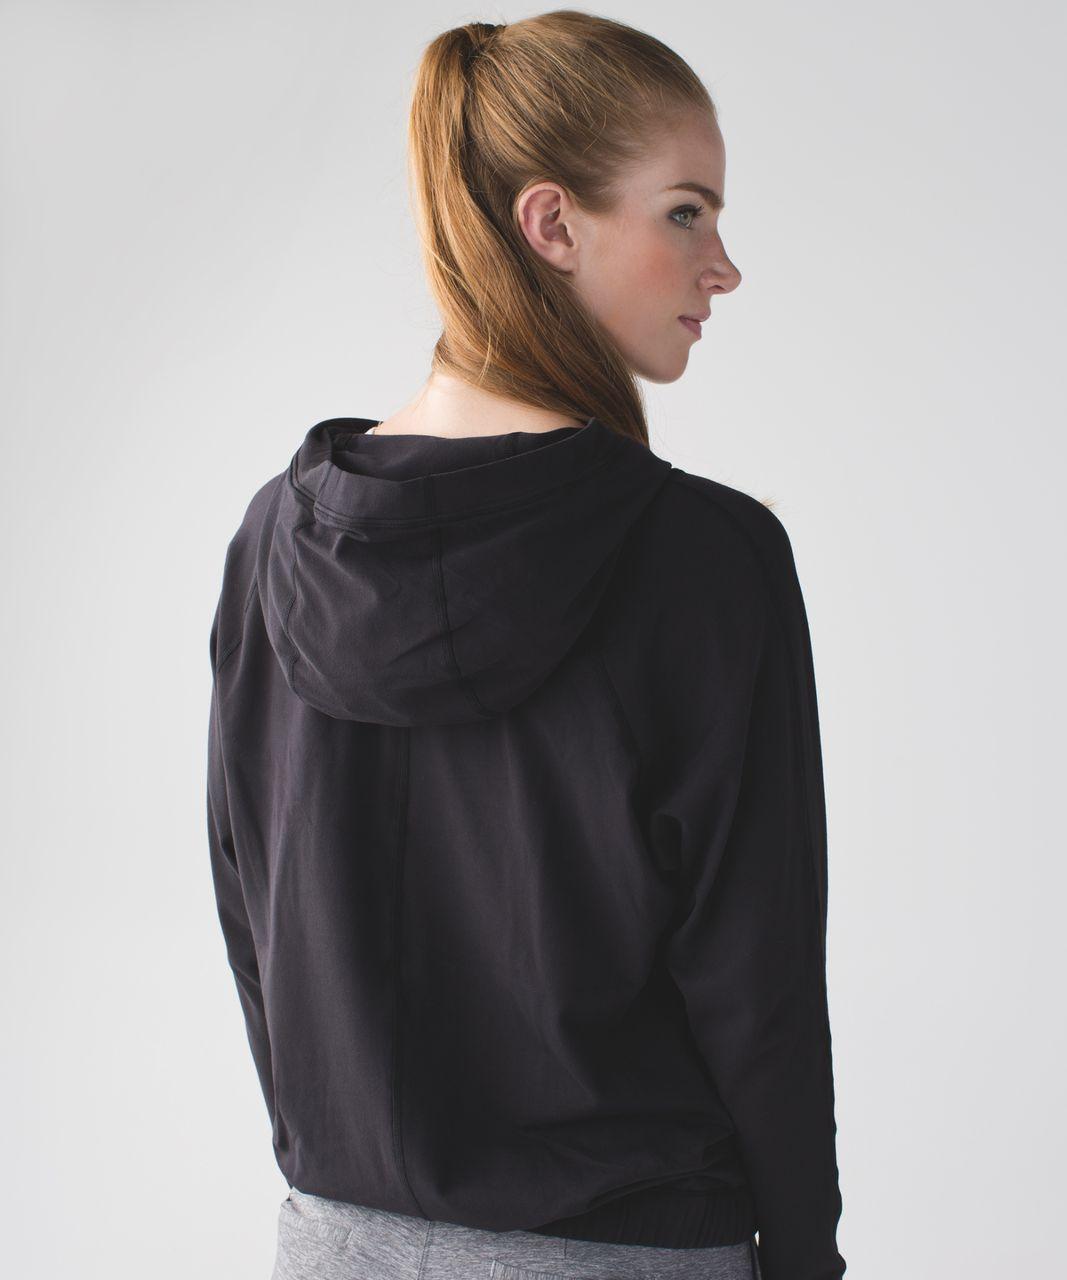 Lululemon Healthy Heart Pullover II - Black